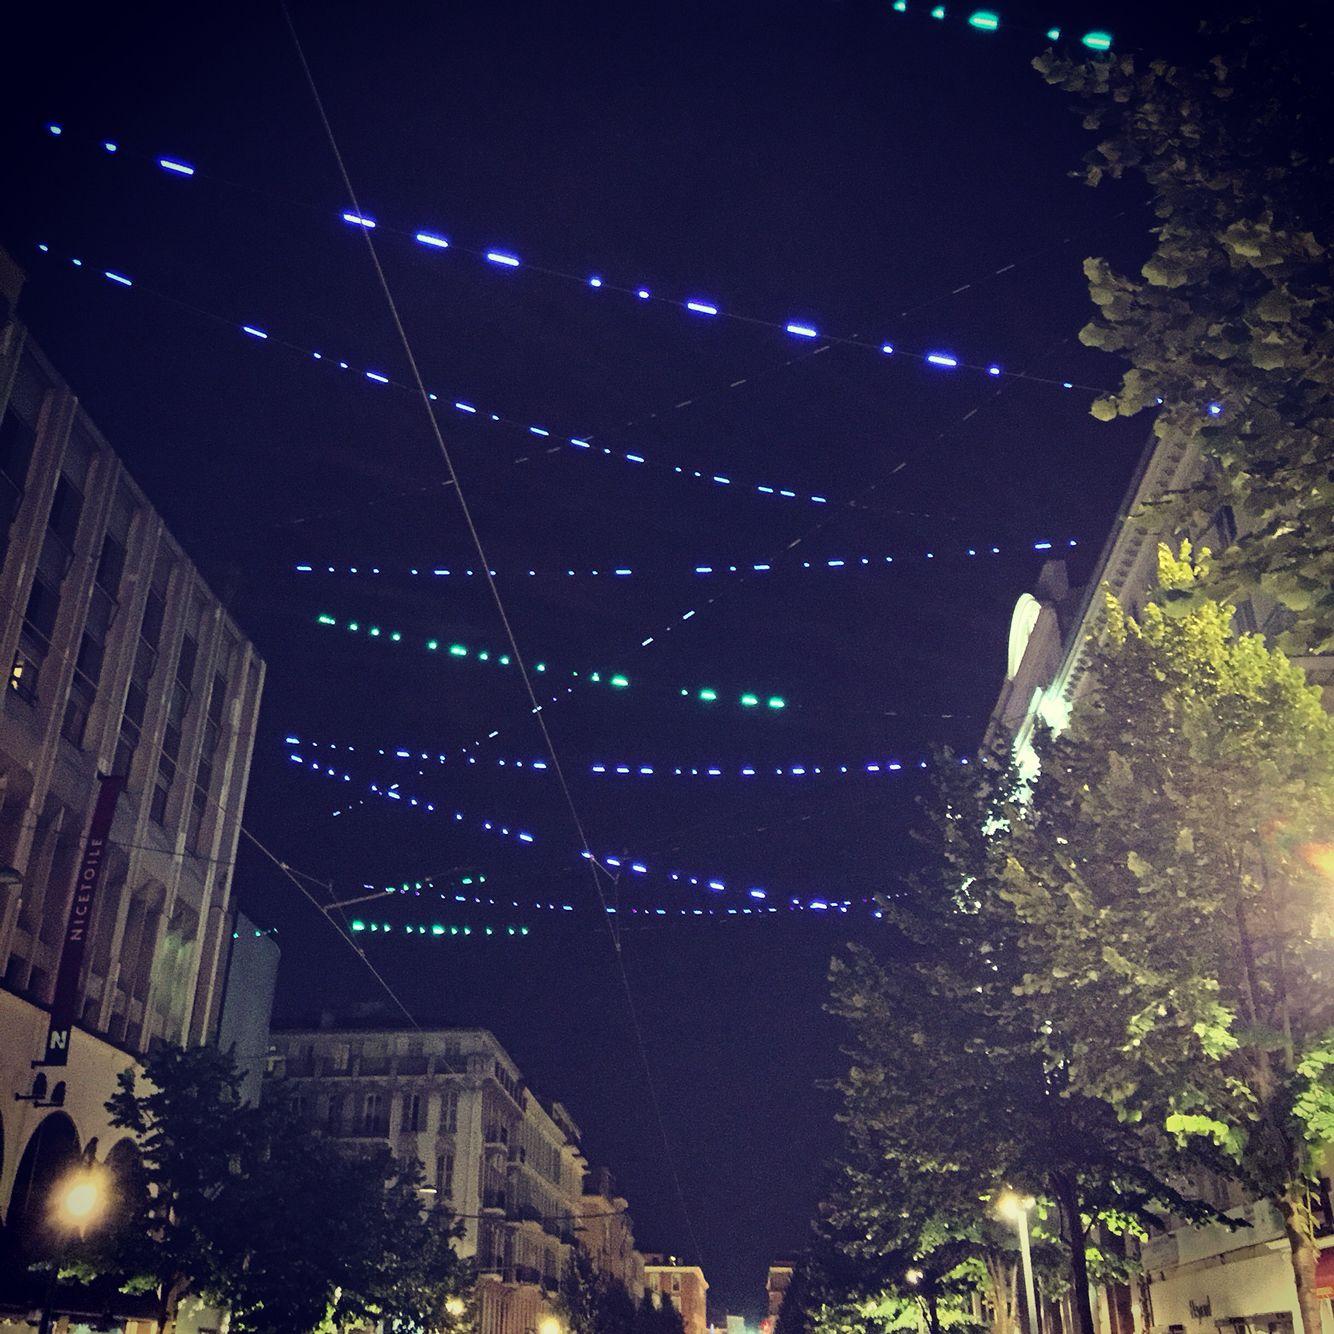 Niza Francia Y Sus Noches Inolvidables Paisajes Pinterest  # Muebles Boj Gijon